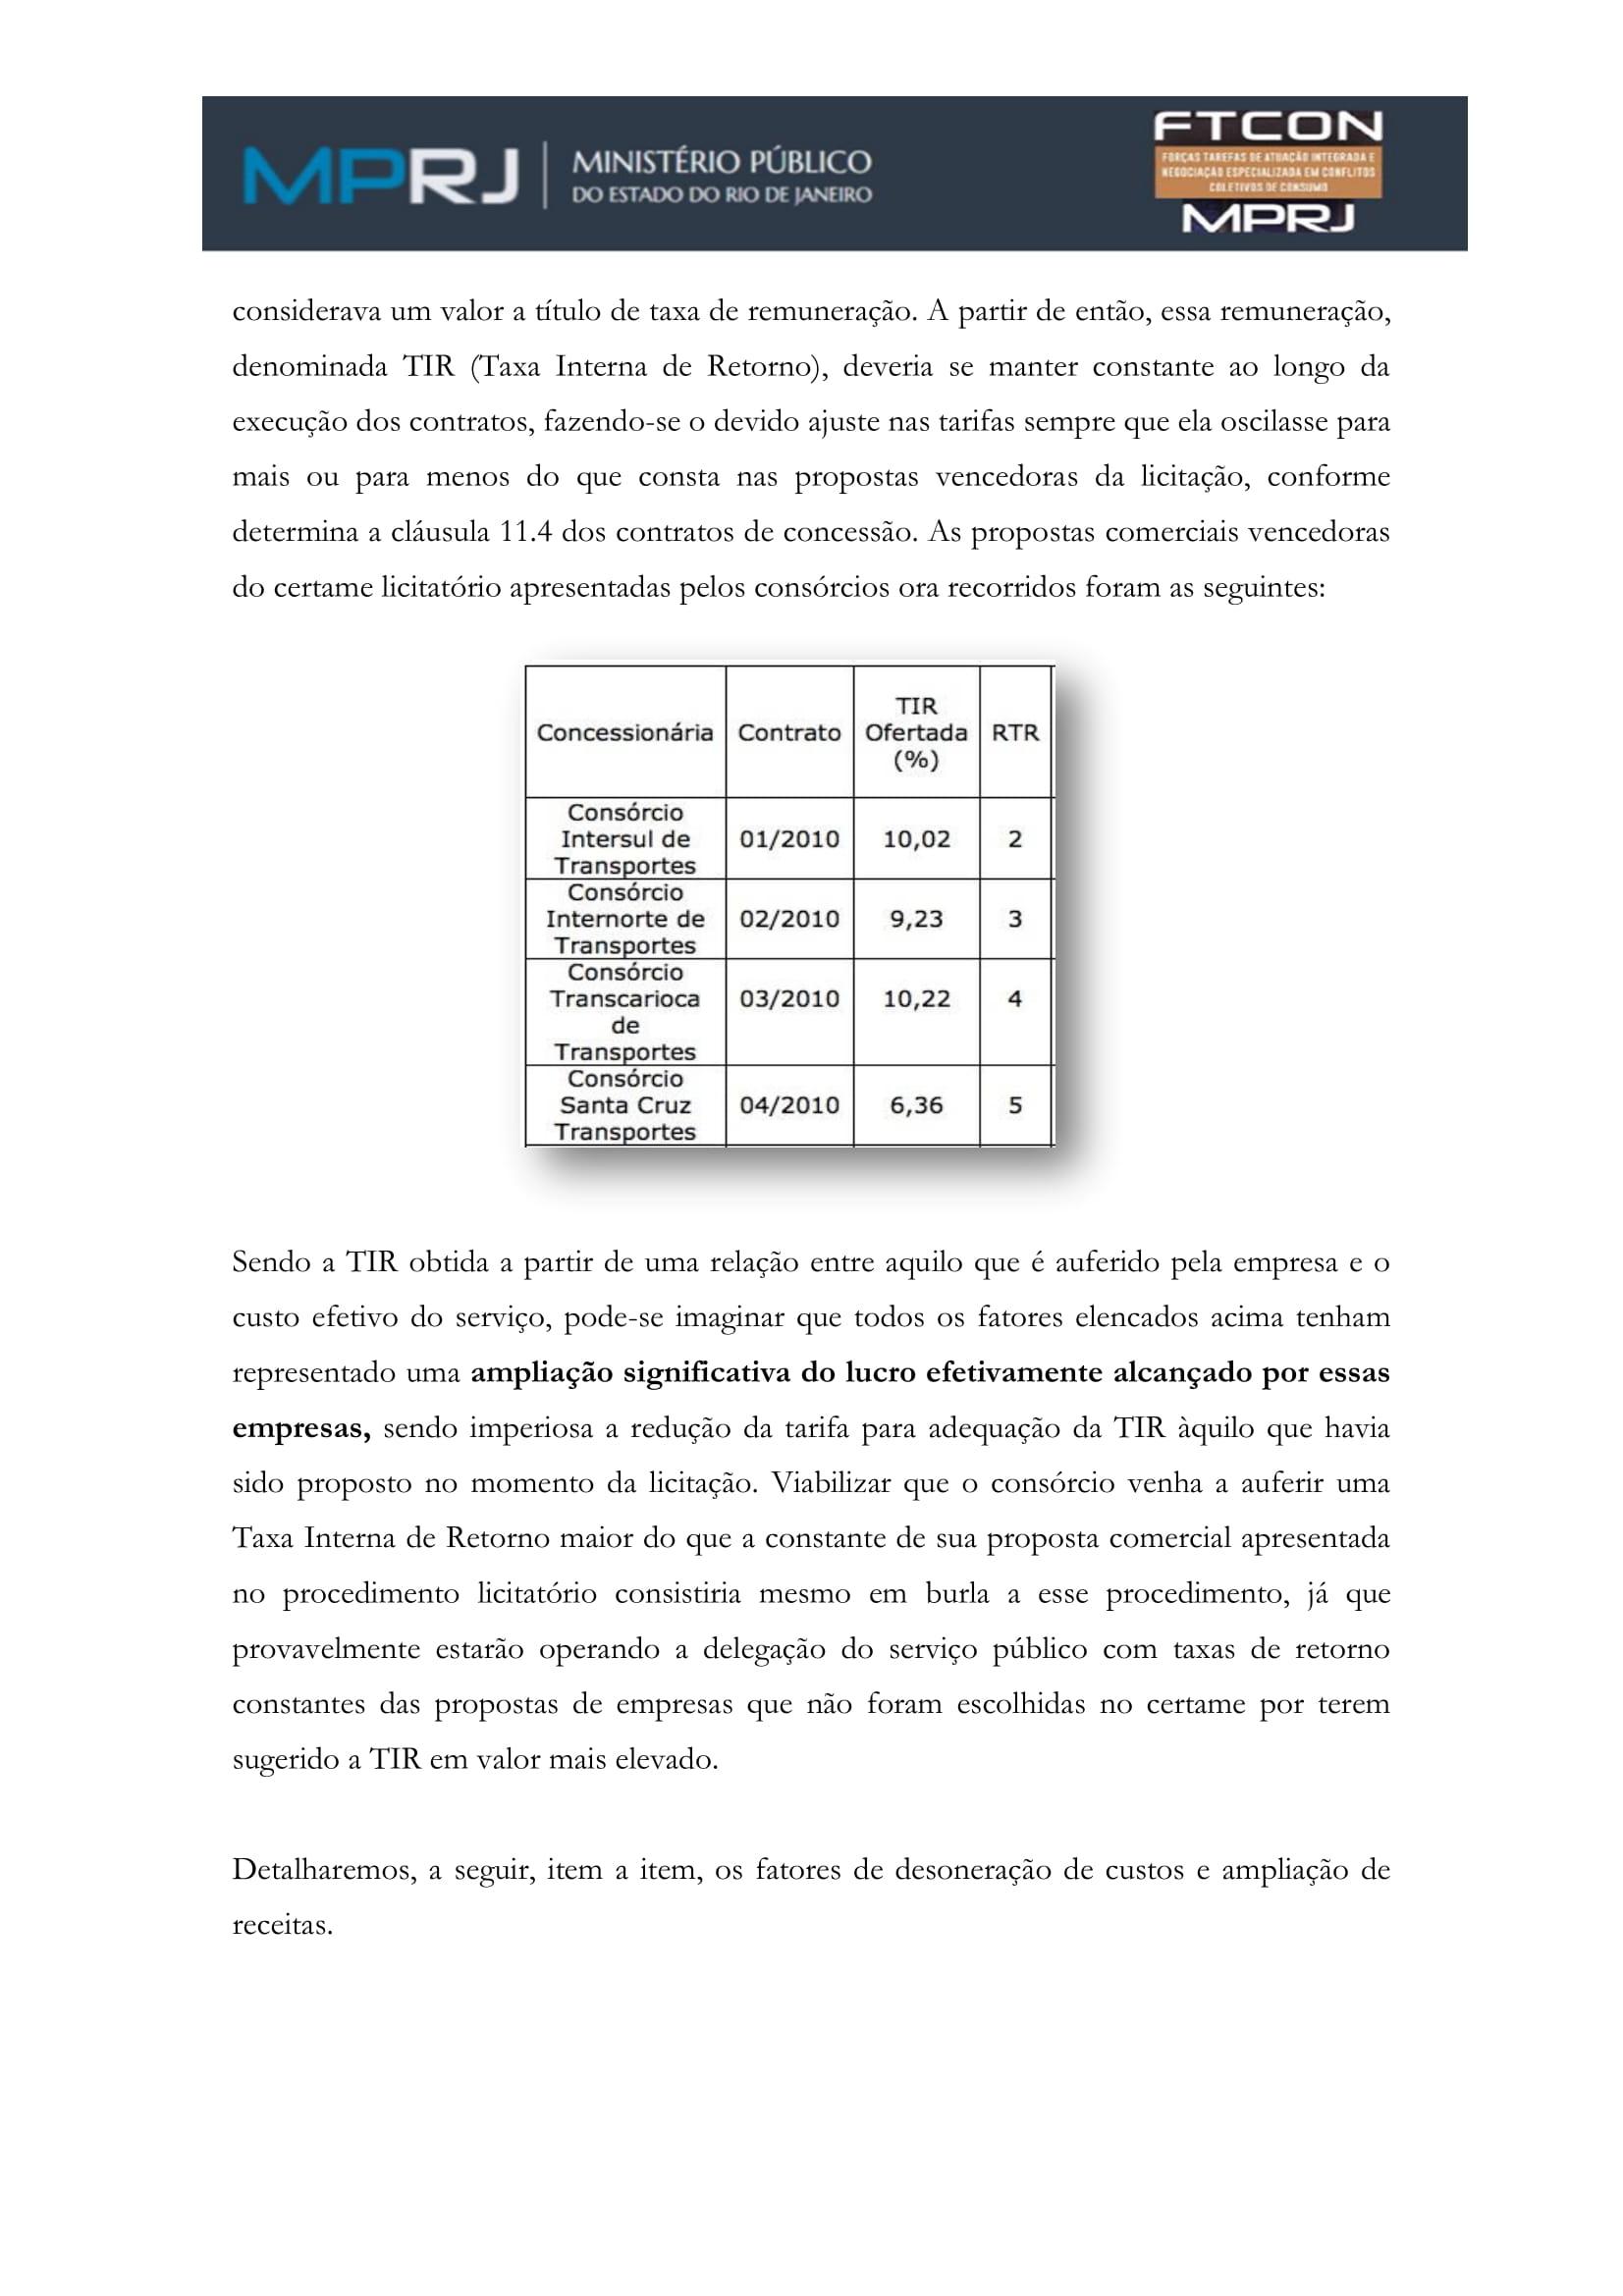 acp_caducidade_onibus_dr_rt-068